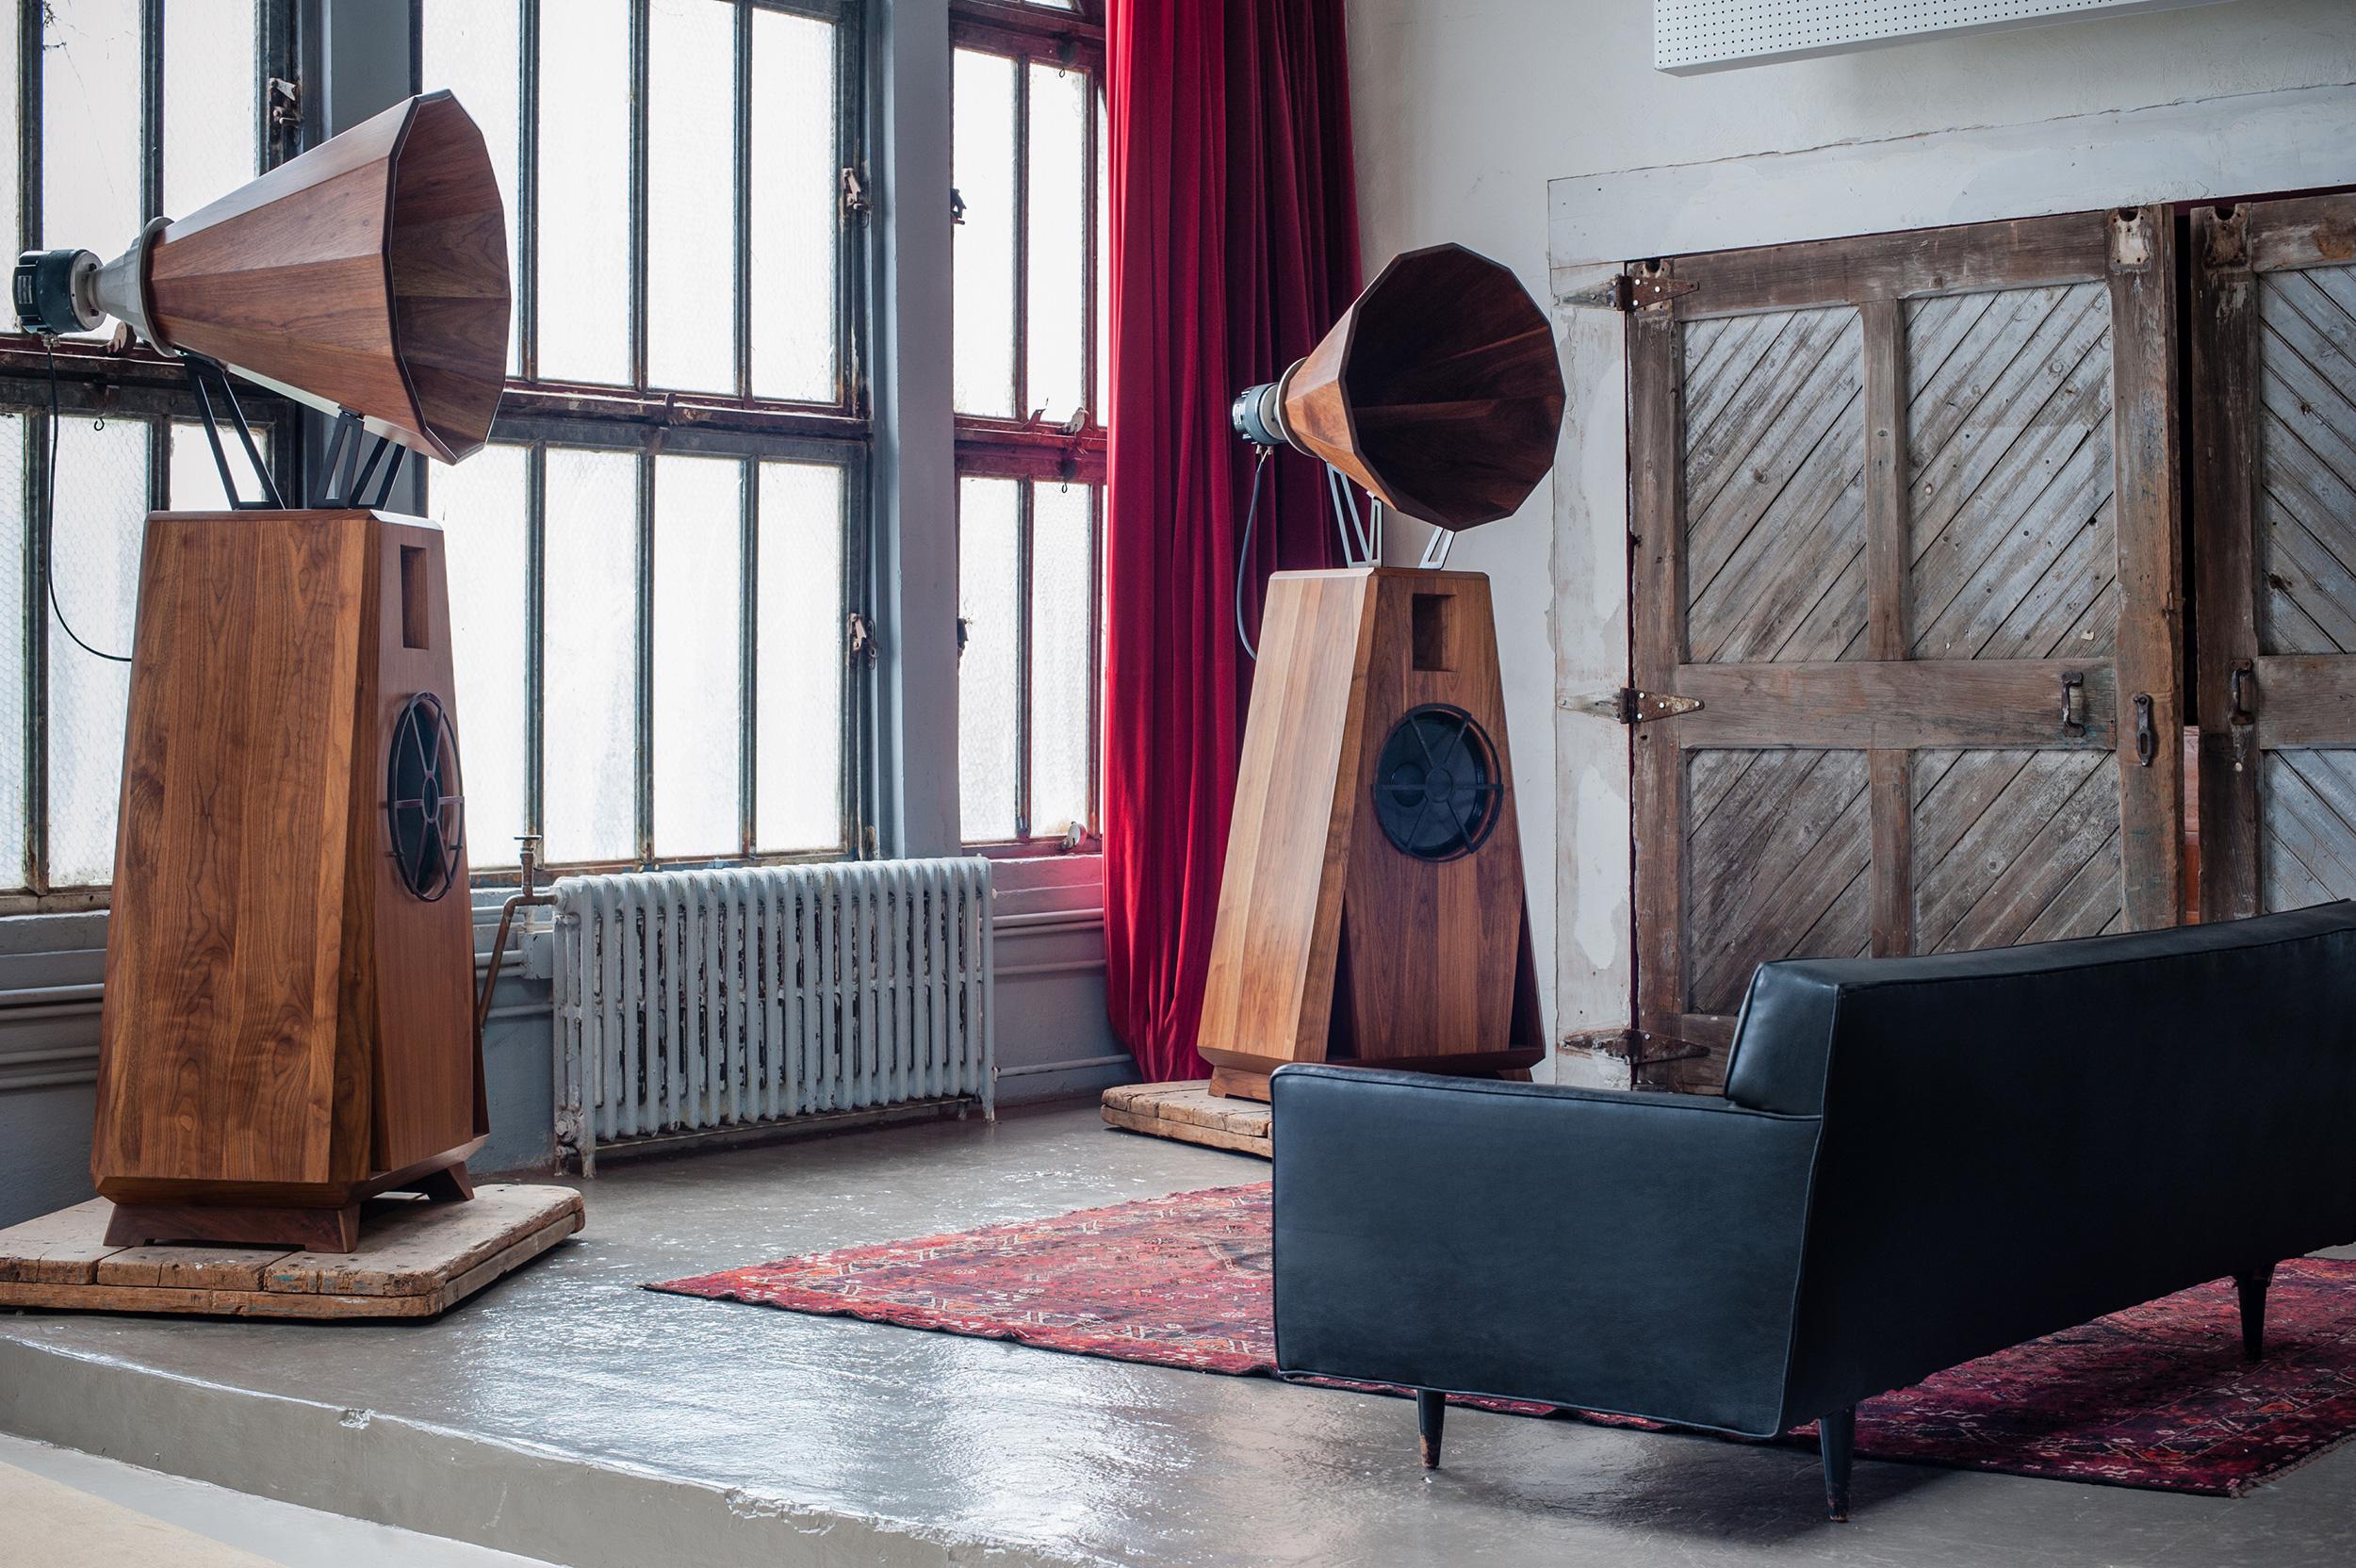 oswalds mill audio ac1 oma loudspeakers. Black Bedroom Furniture Sets. Home Design Ideas